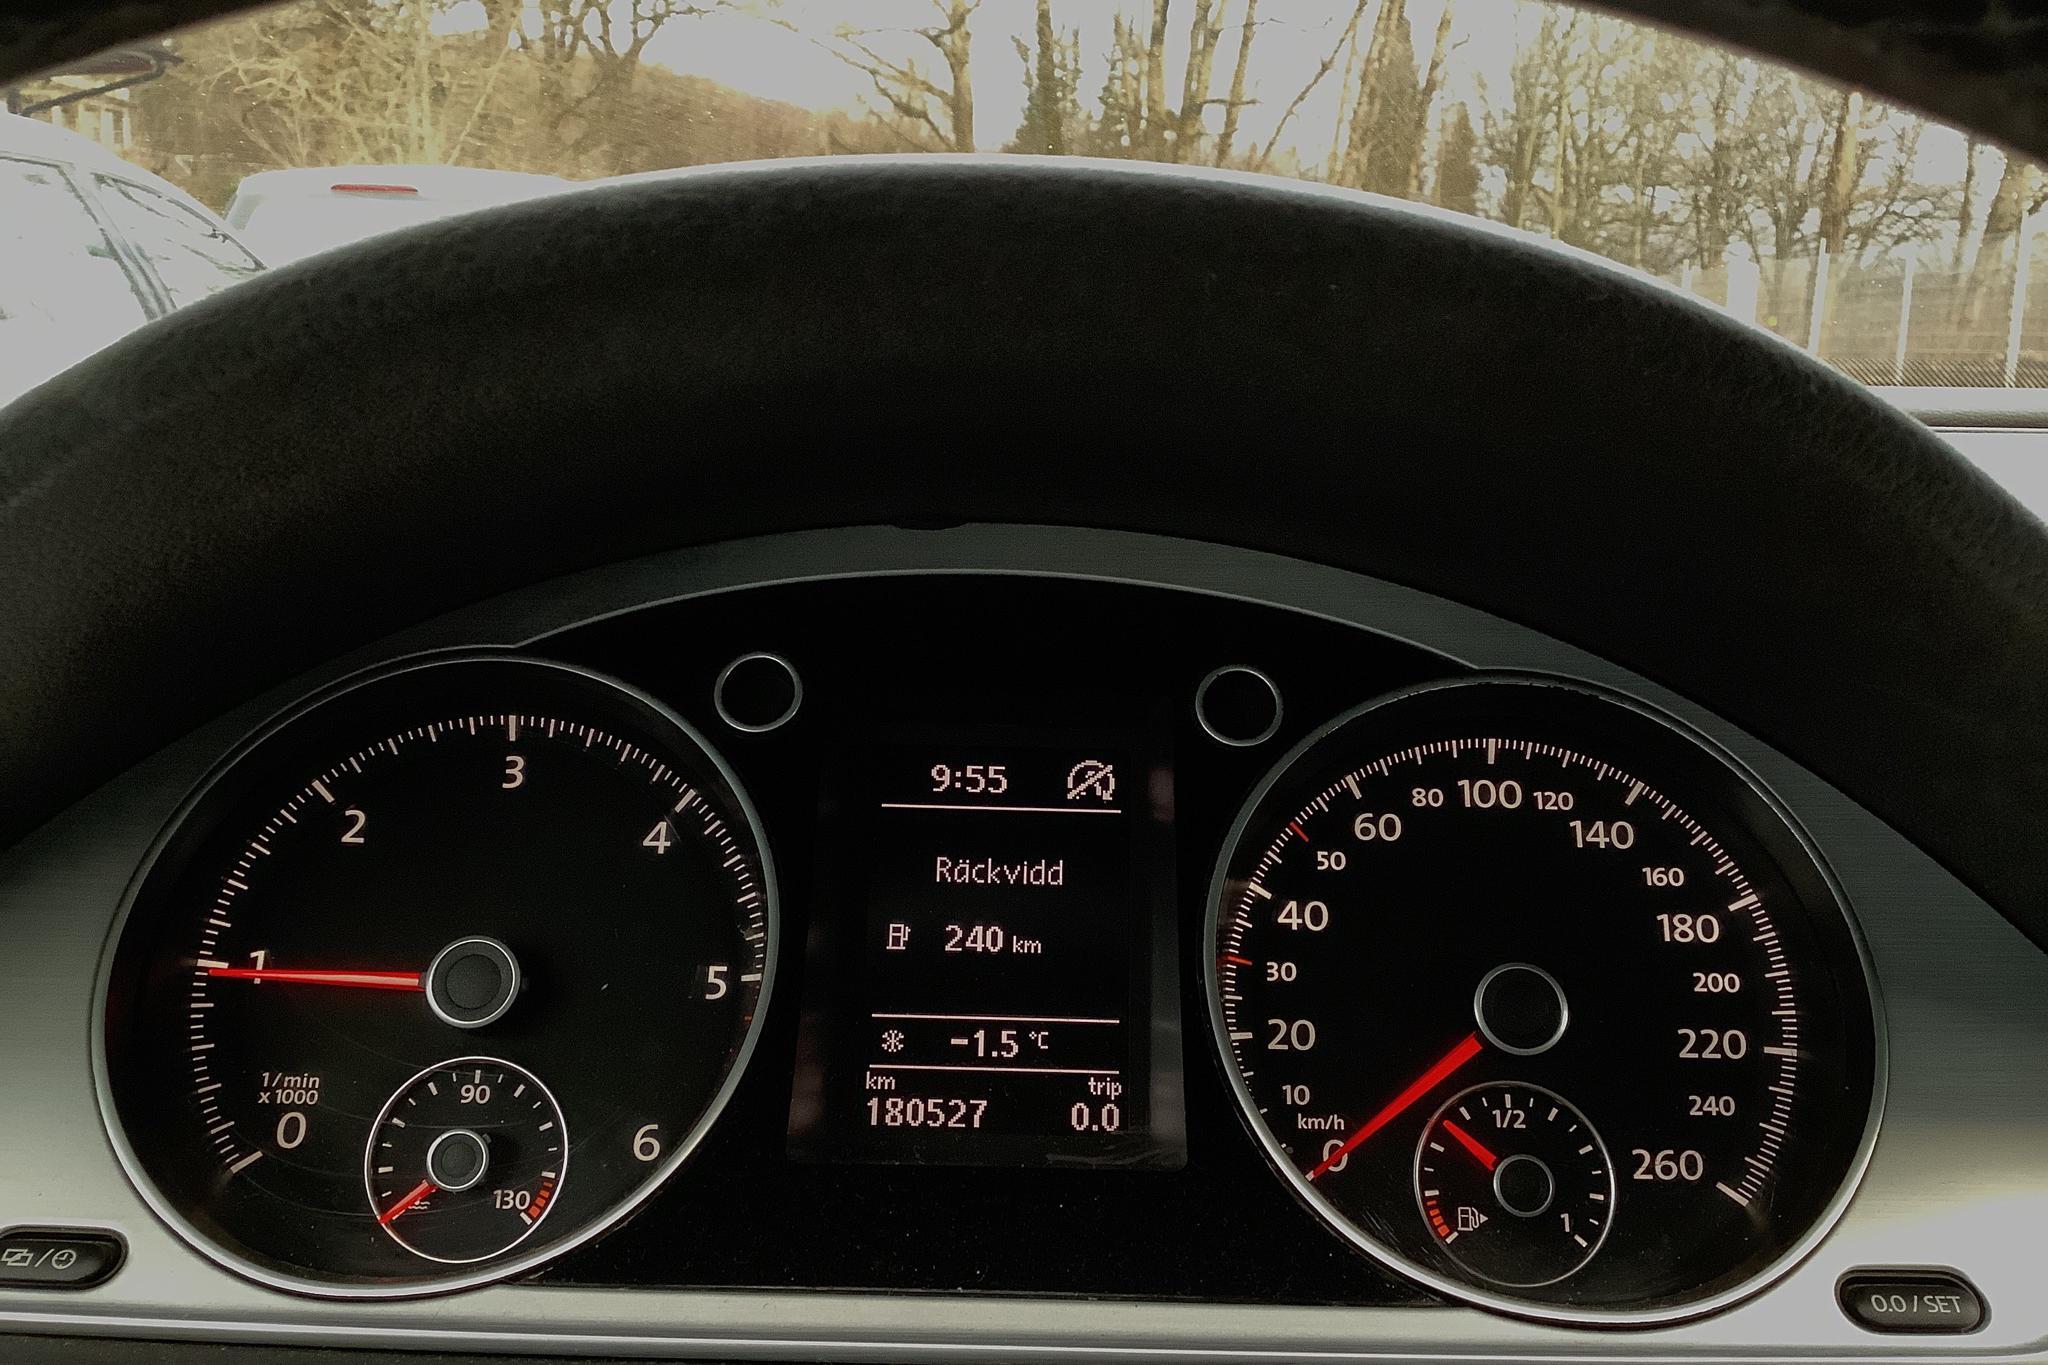 VW Passat Alltrack 2.0 TDI BlueMotion Technology 4Motion (170hk) - 18 052 mil - Automat - vit - 2013